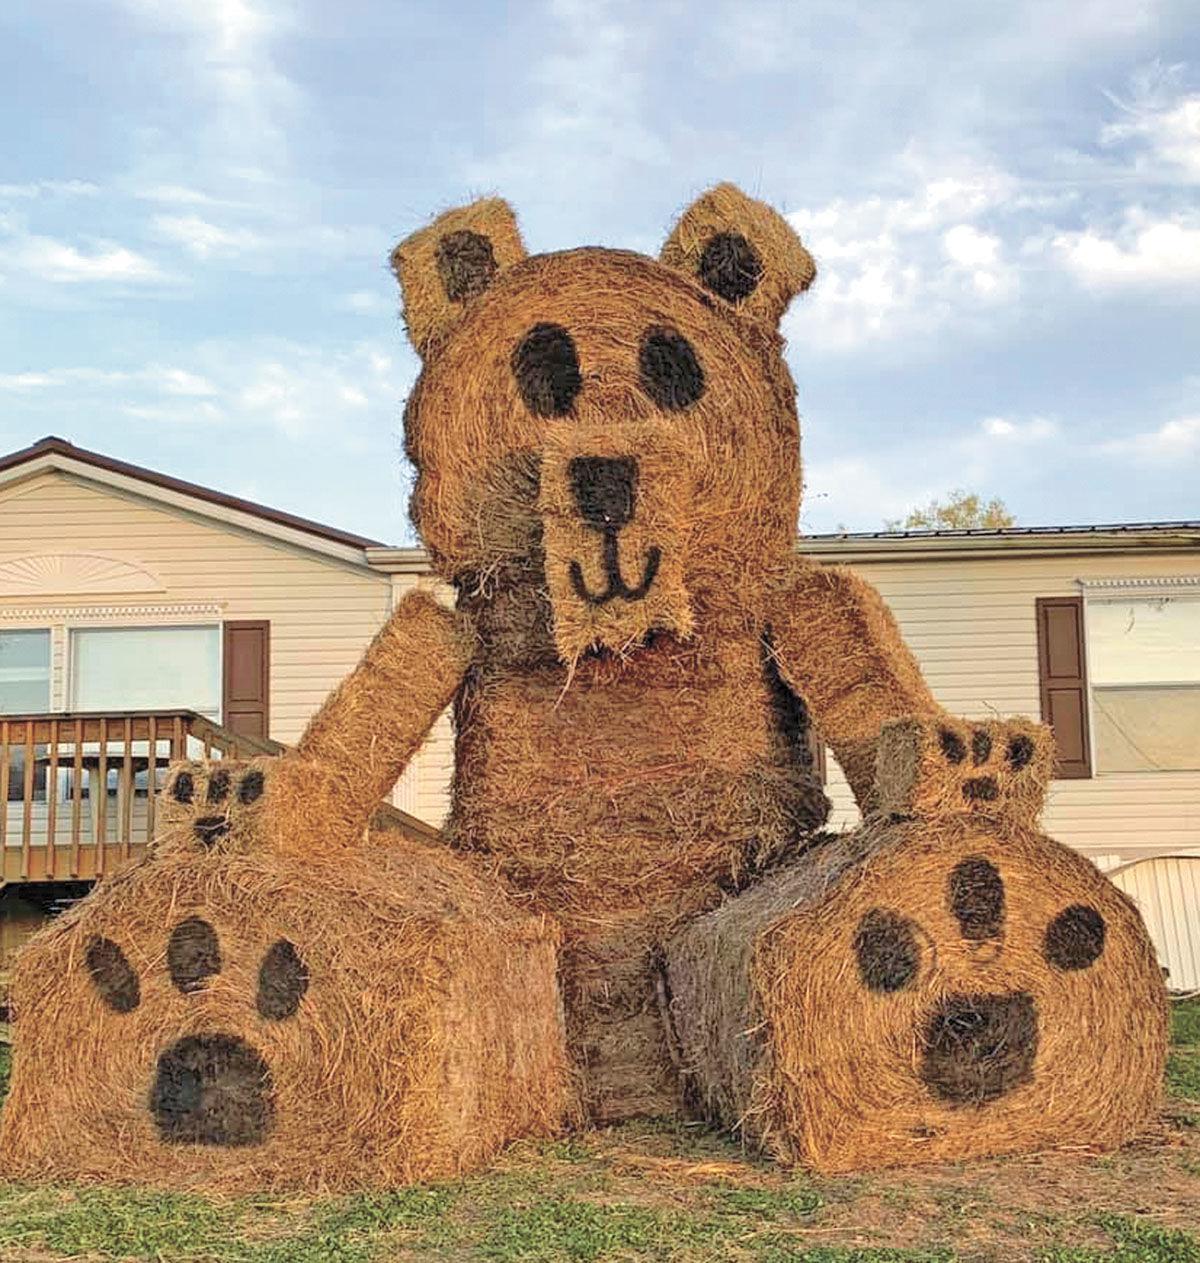 Parents and Kids enjoy bear-themed scavenger hunt